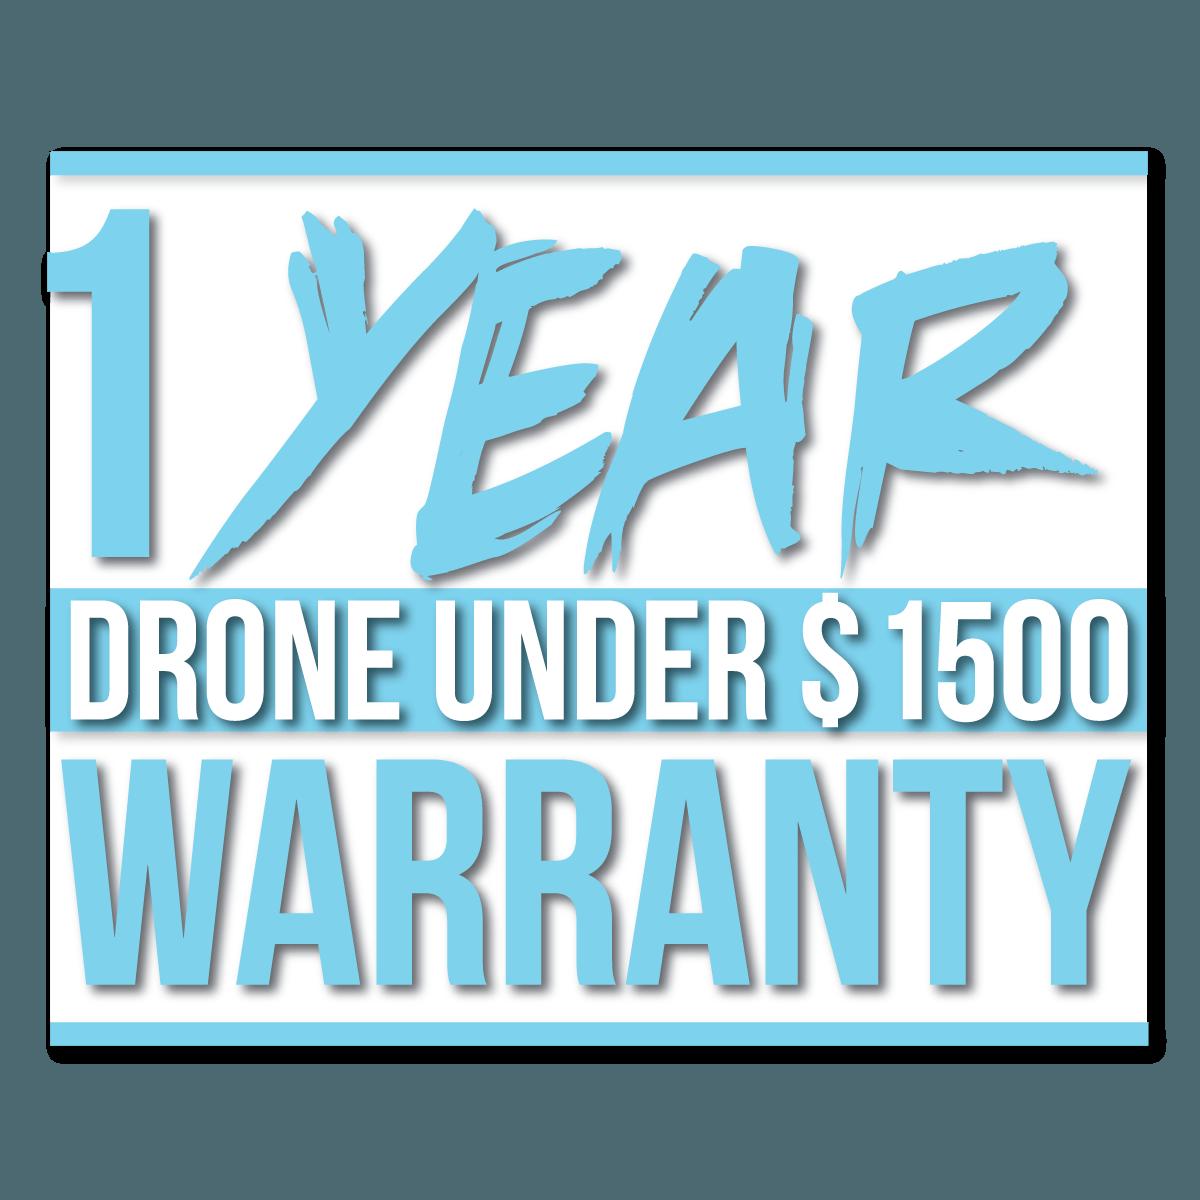 cps-warranty-verydrone-1500-drone-phantom-4-pro-plus-mavic-pro